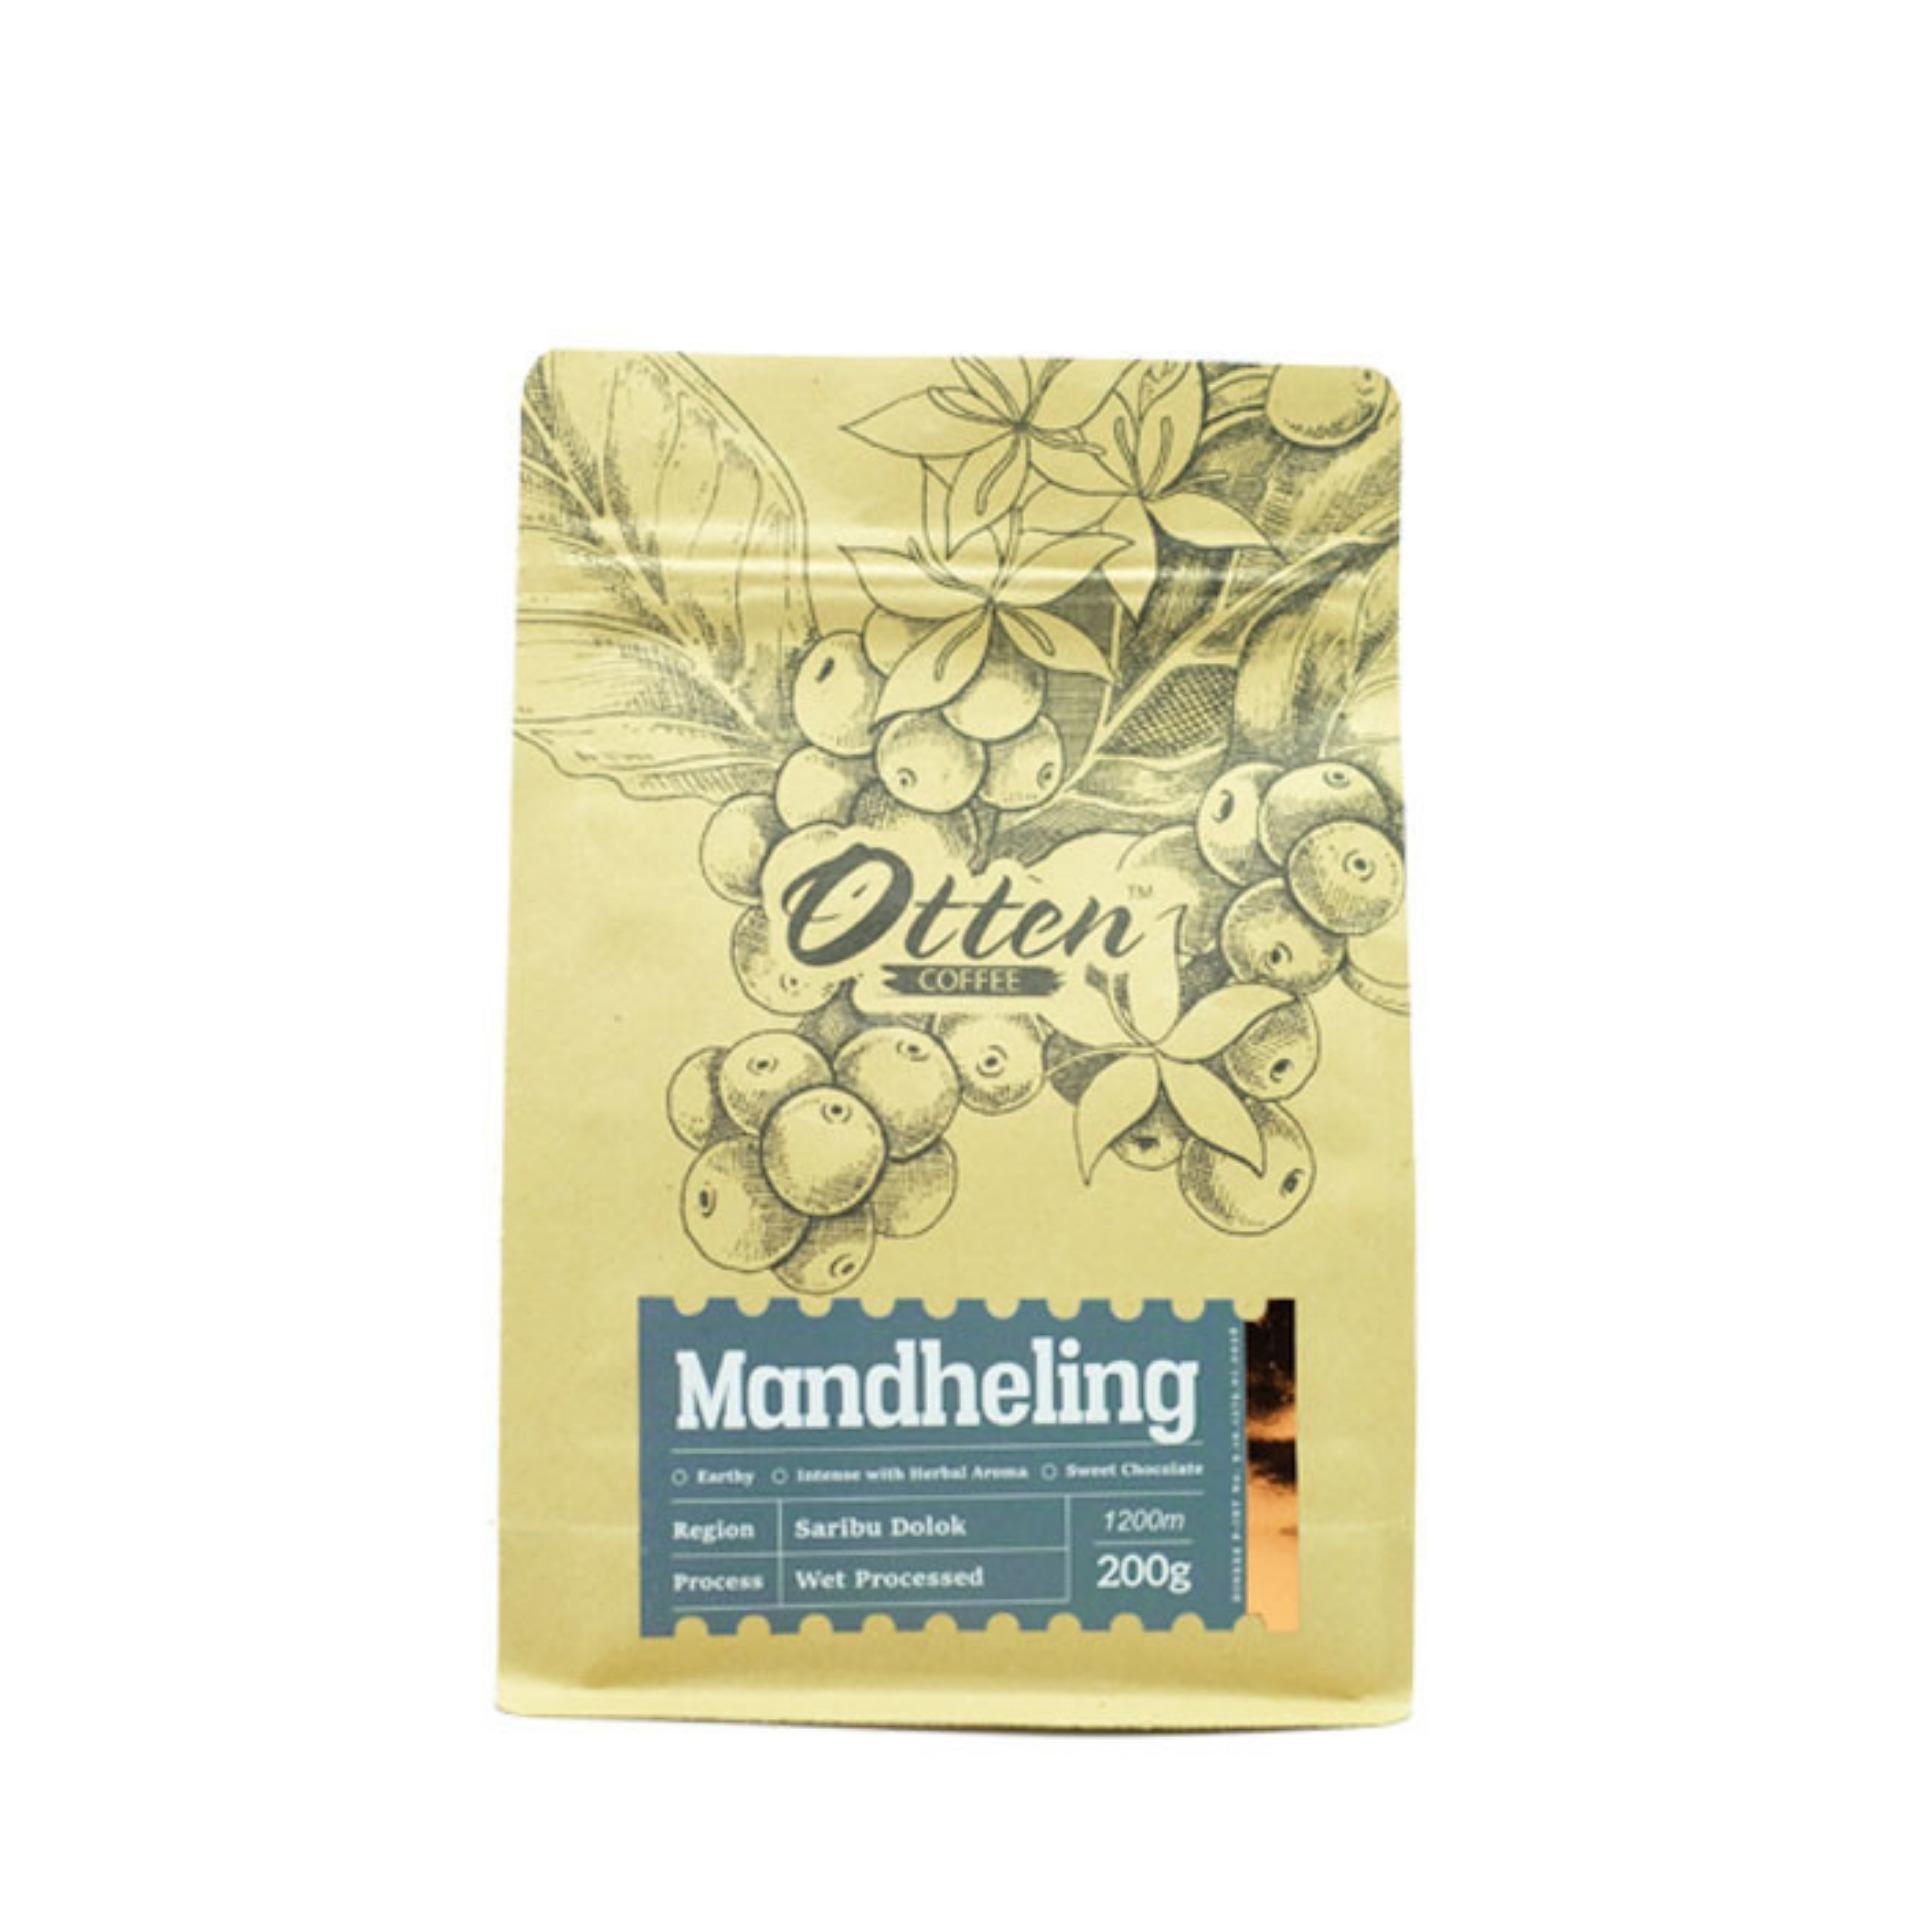 Otten Coffee Arabica Mandheling 200g - Biji Kopi